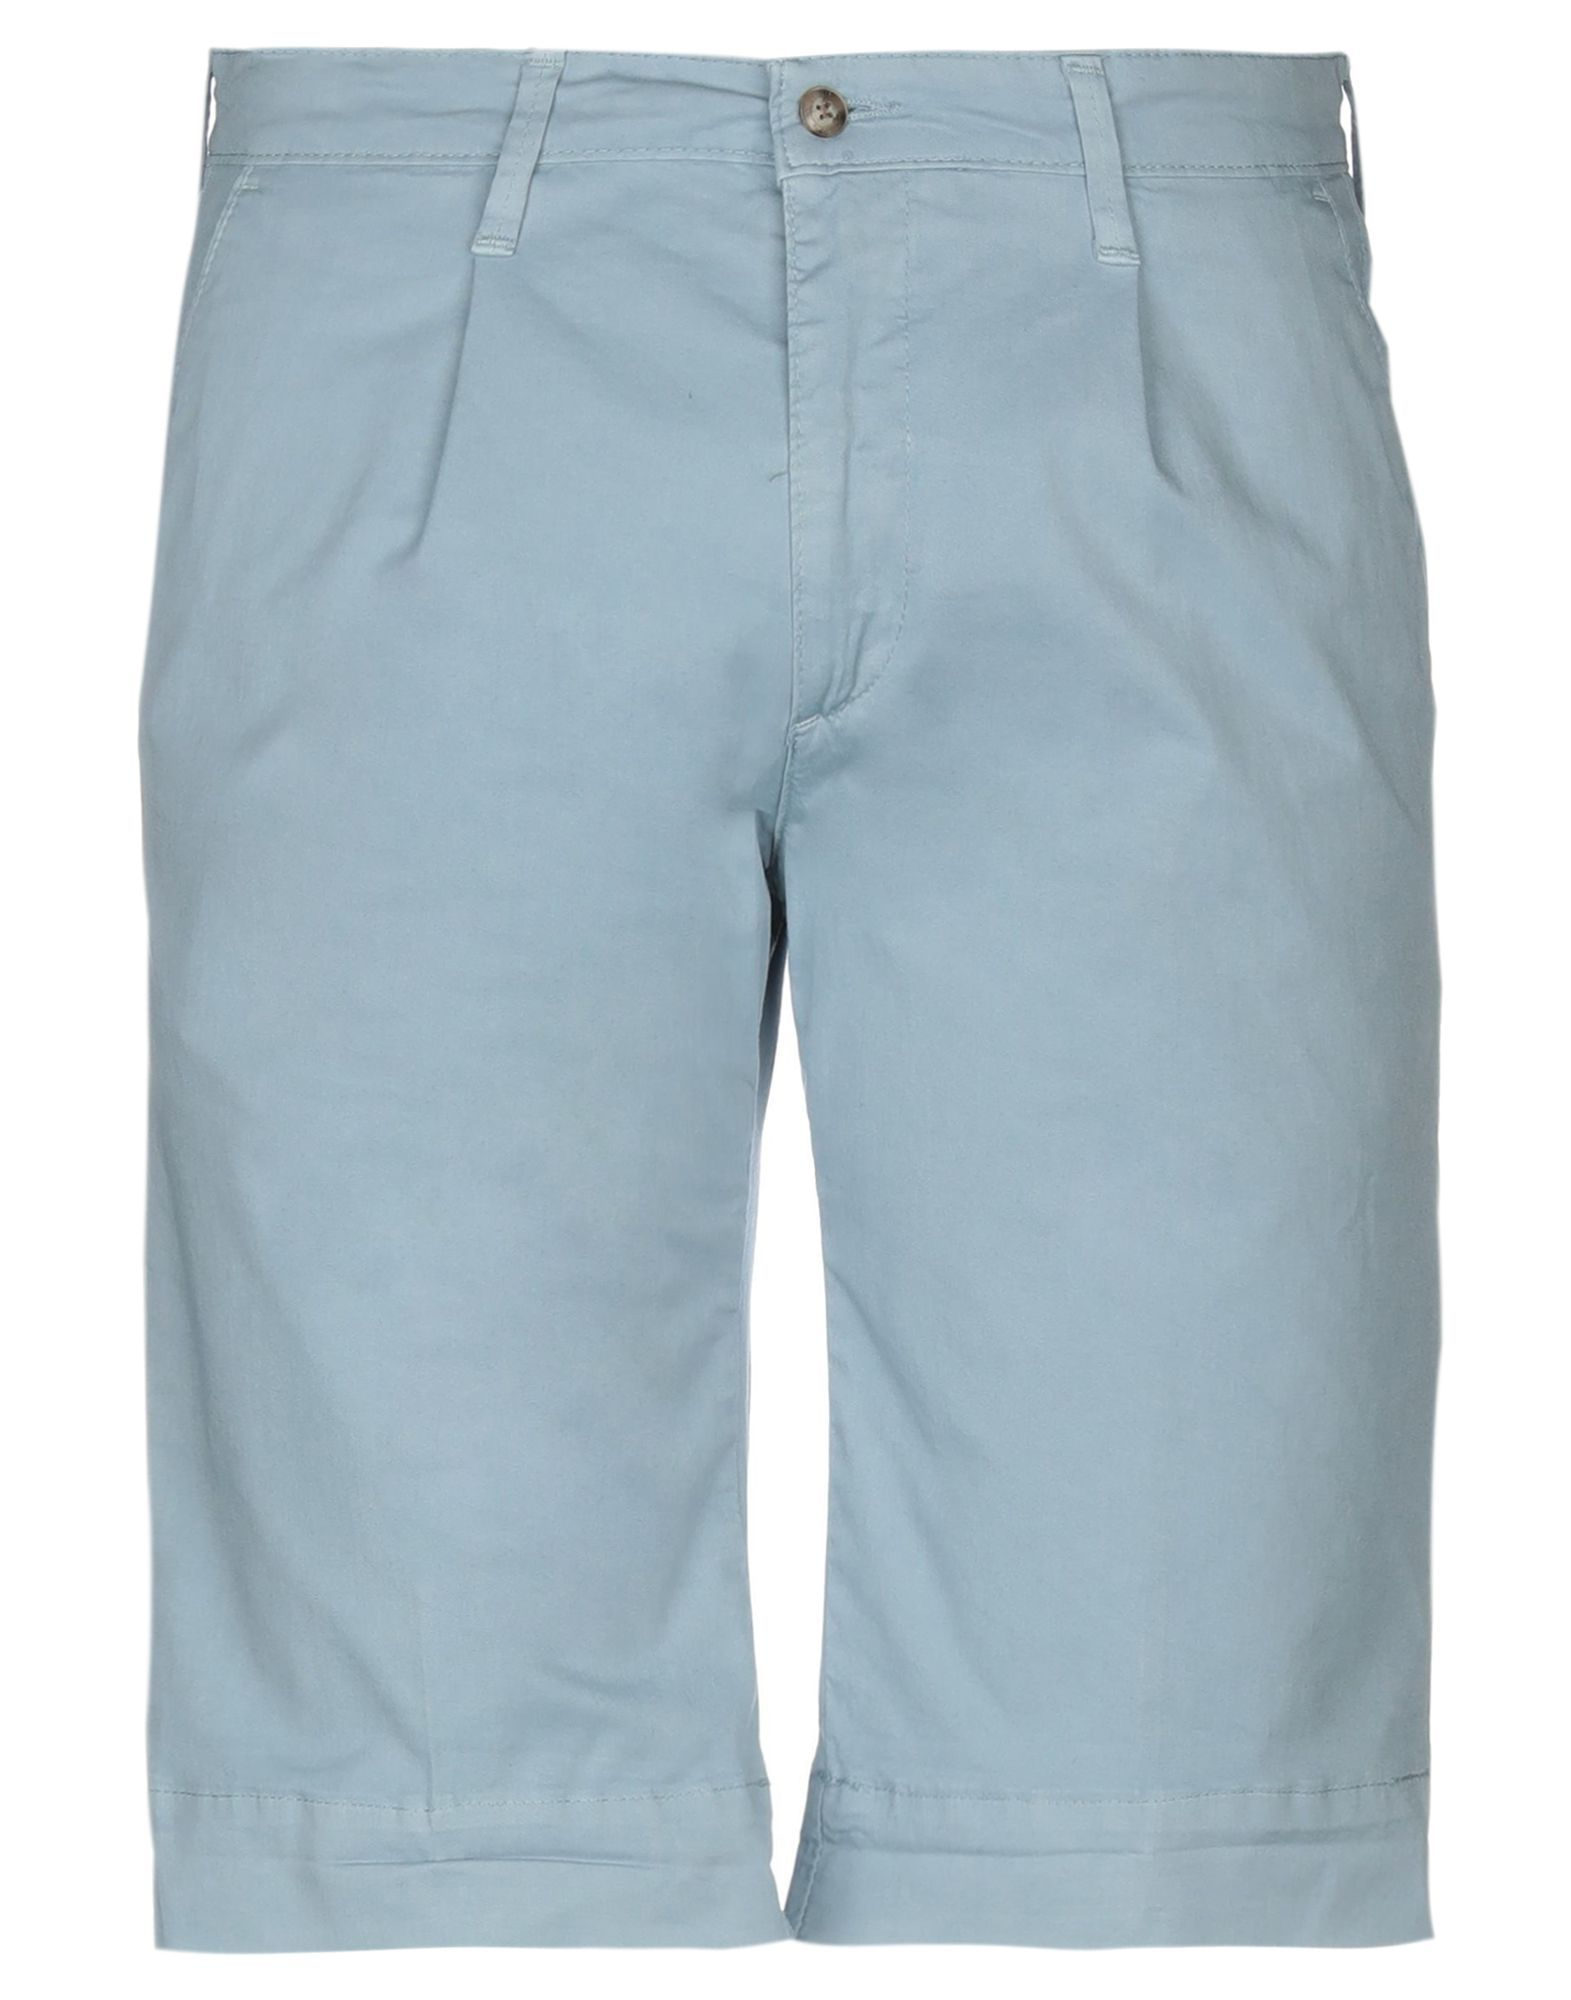 Briglia 1949 Sky Blue Cotton Shorts